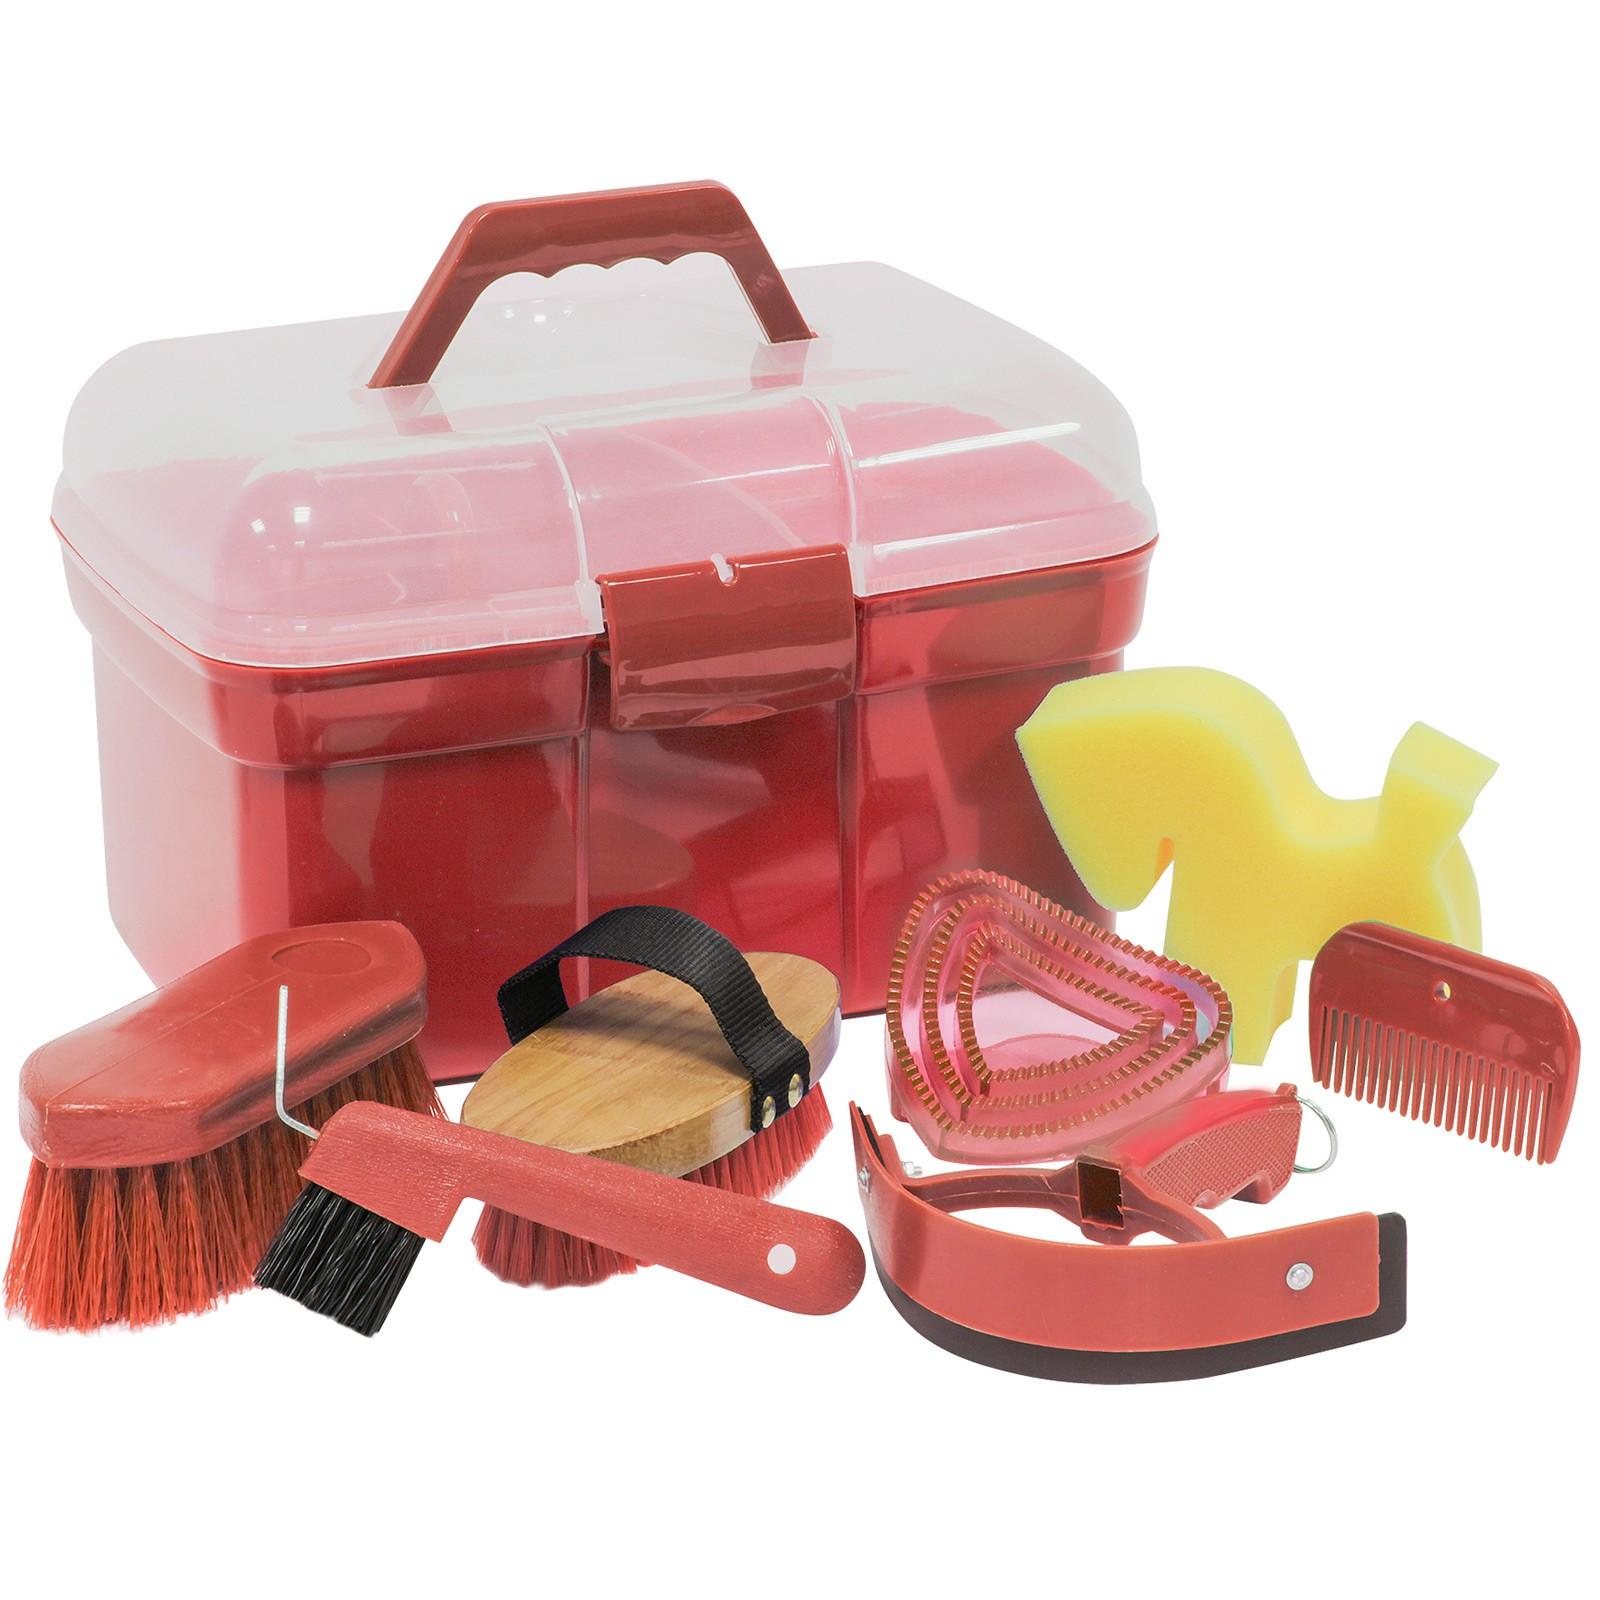 Grooming Equipment